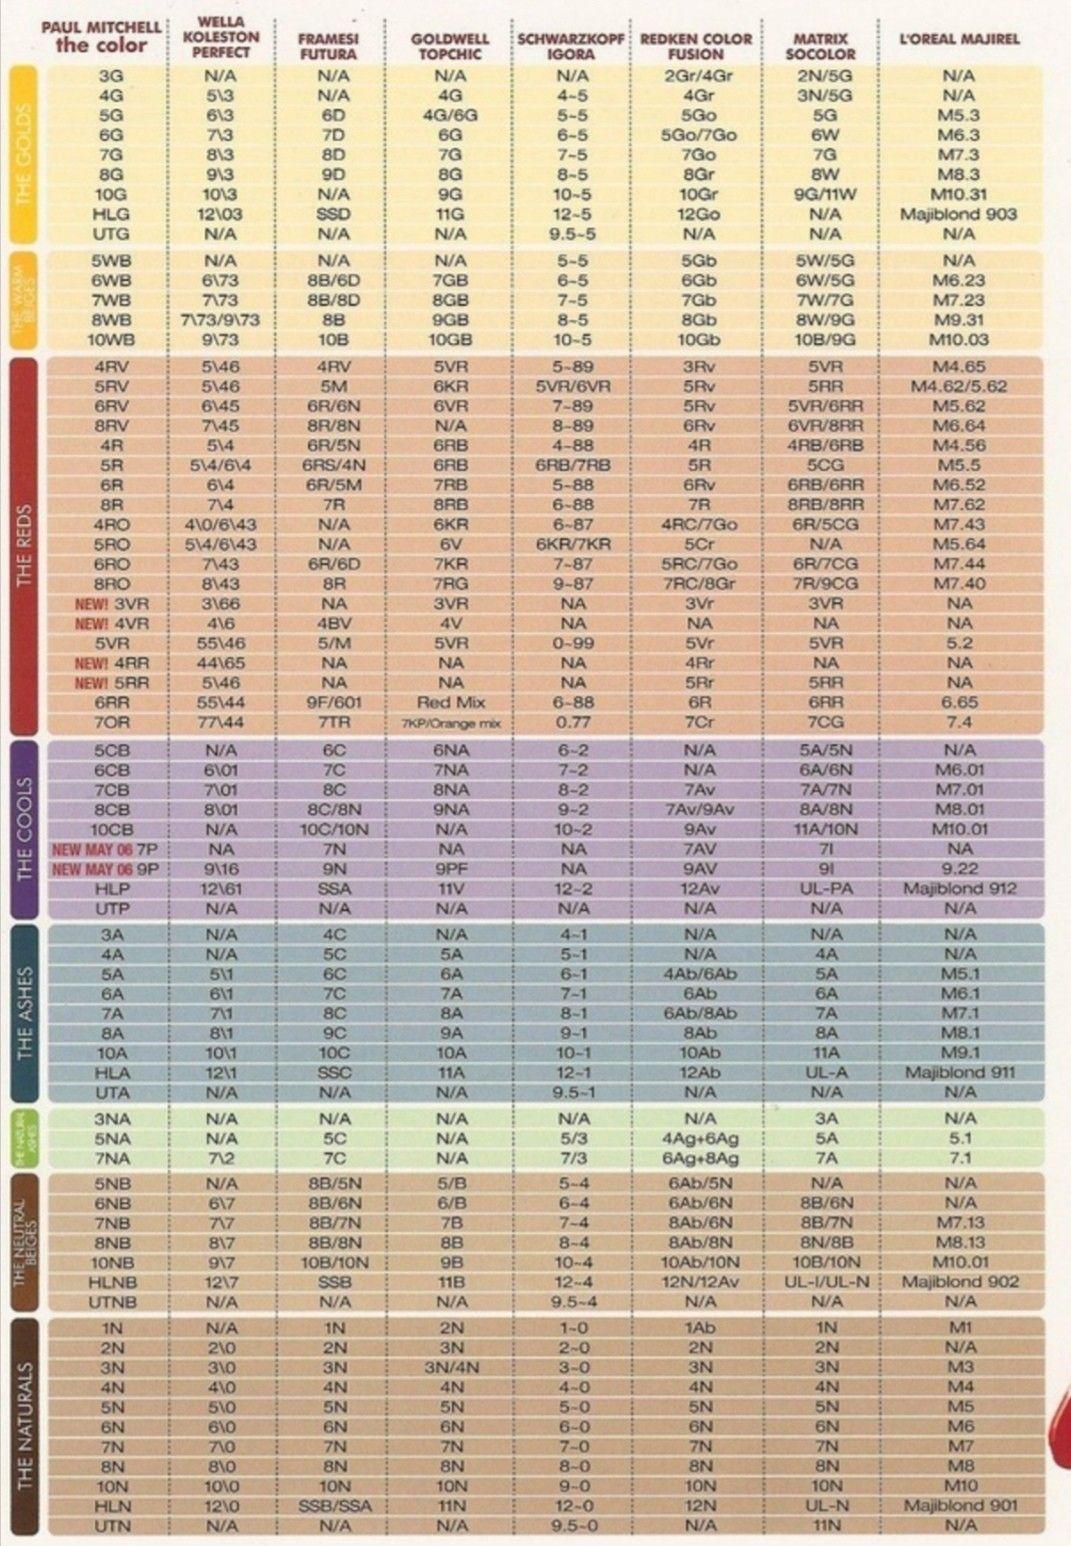 Pin On Hair Color Formulas